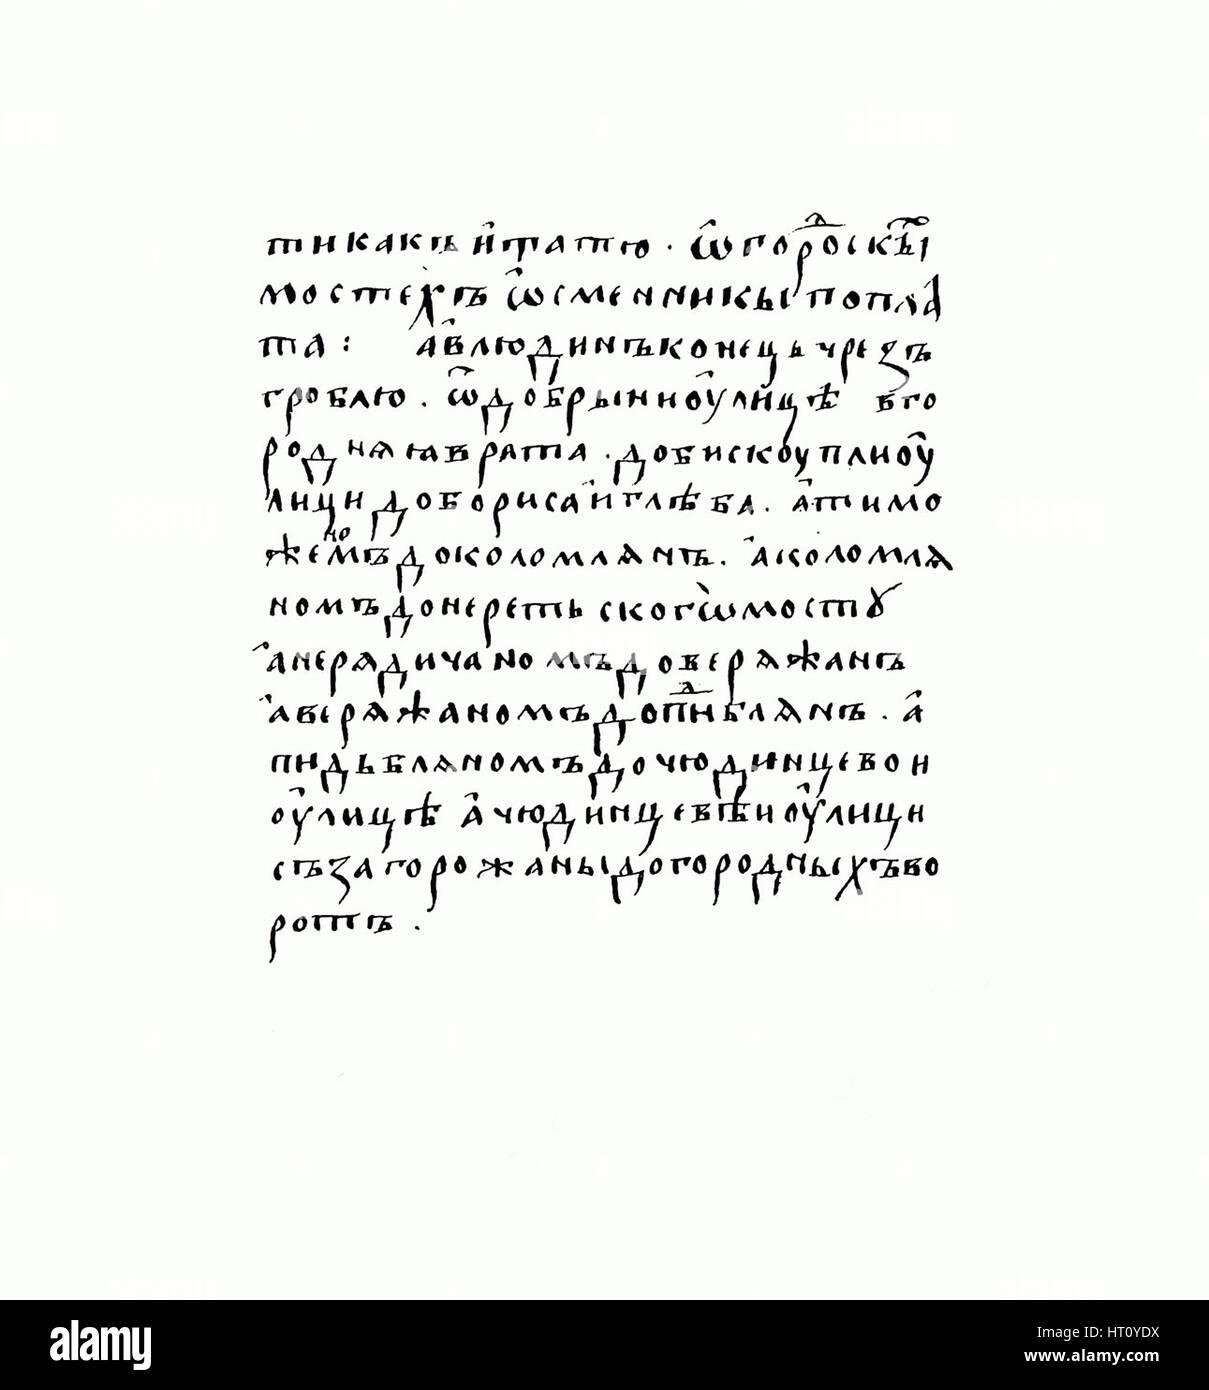 Kopie des Manuskripts der Russkaya Pravda. Künstler: Historisches Dokument Stockbild